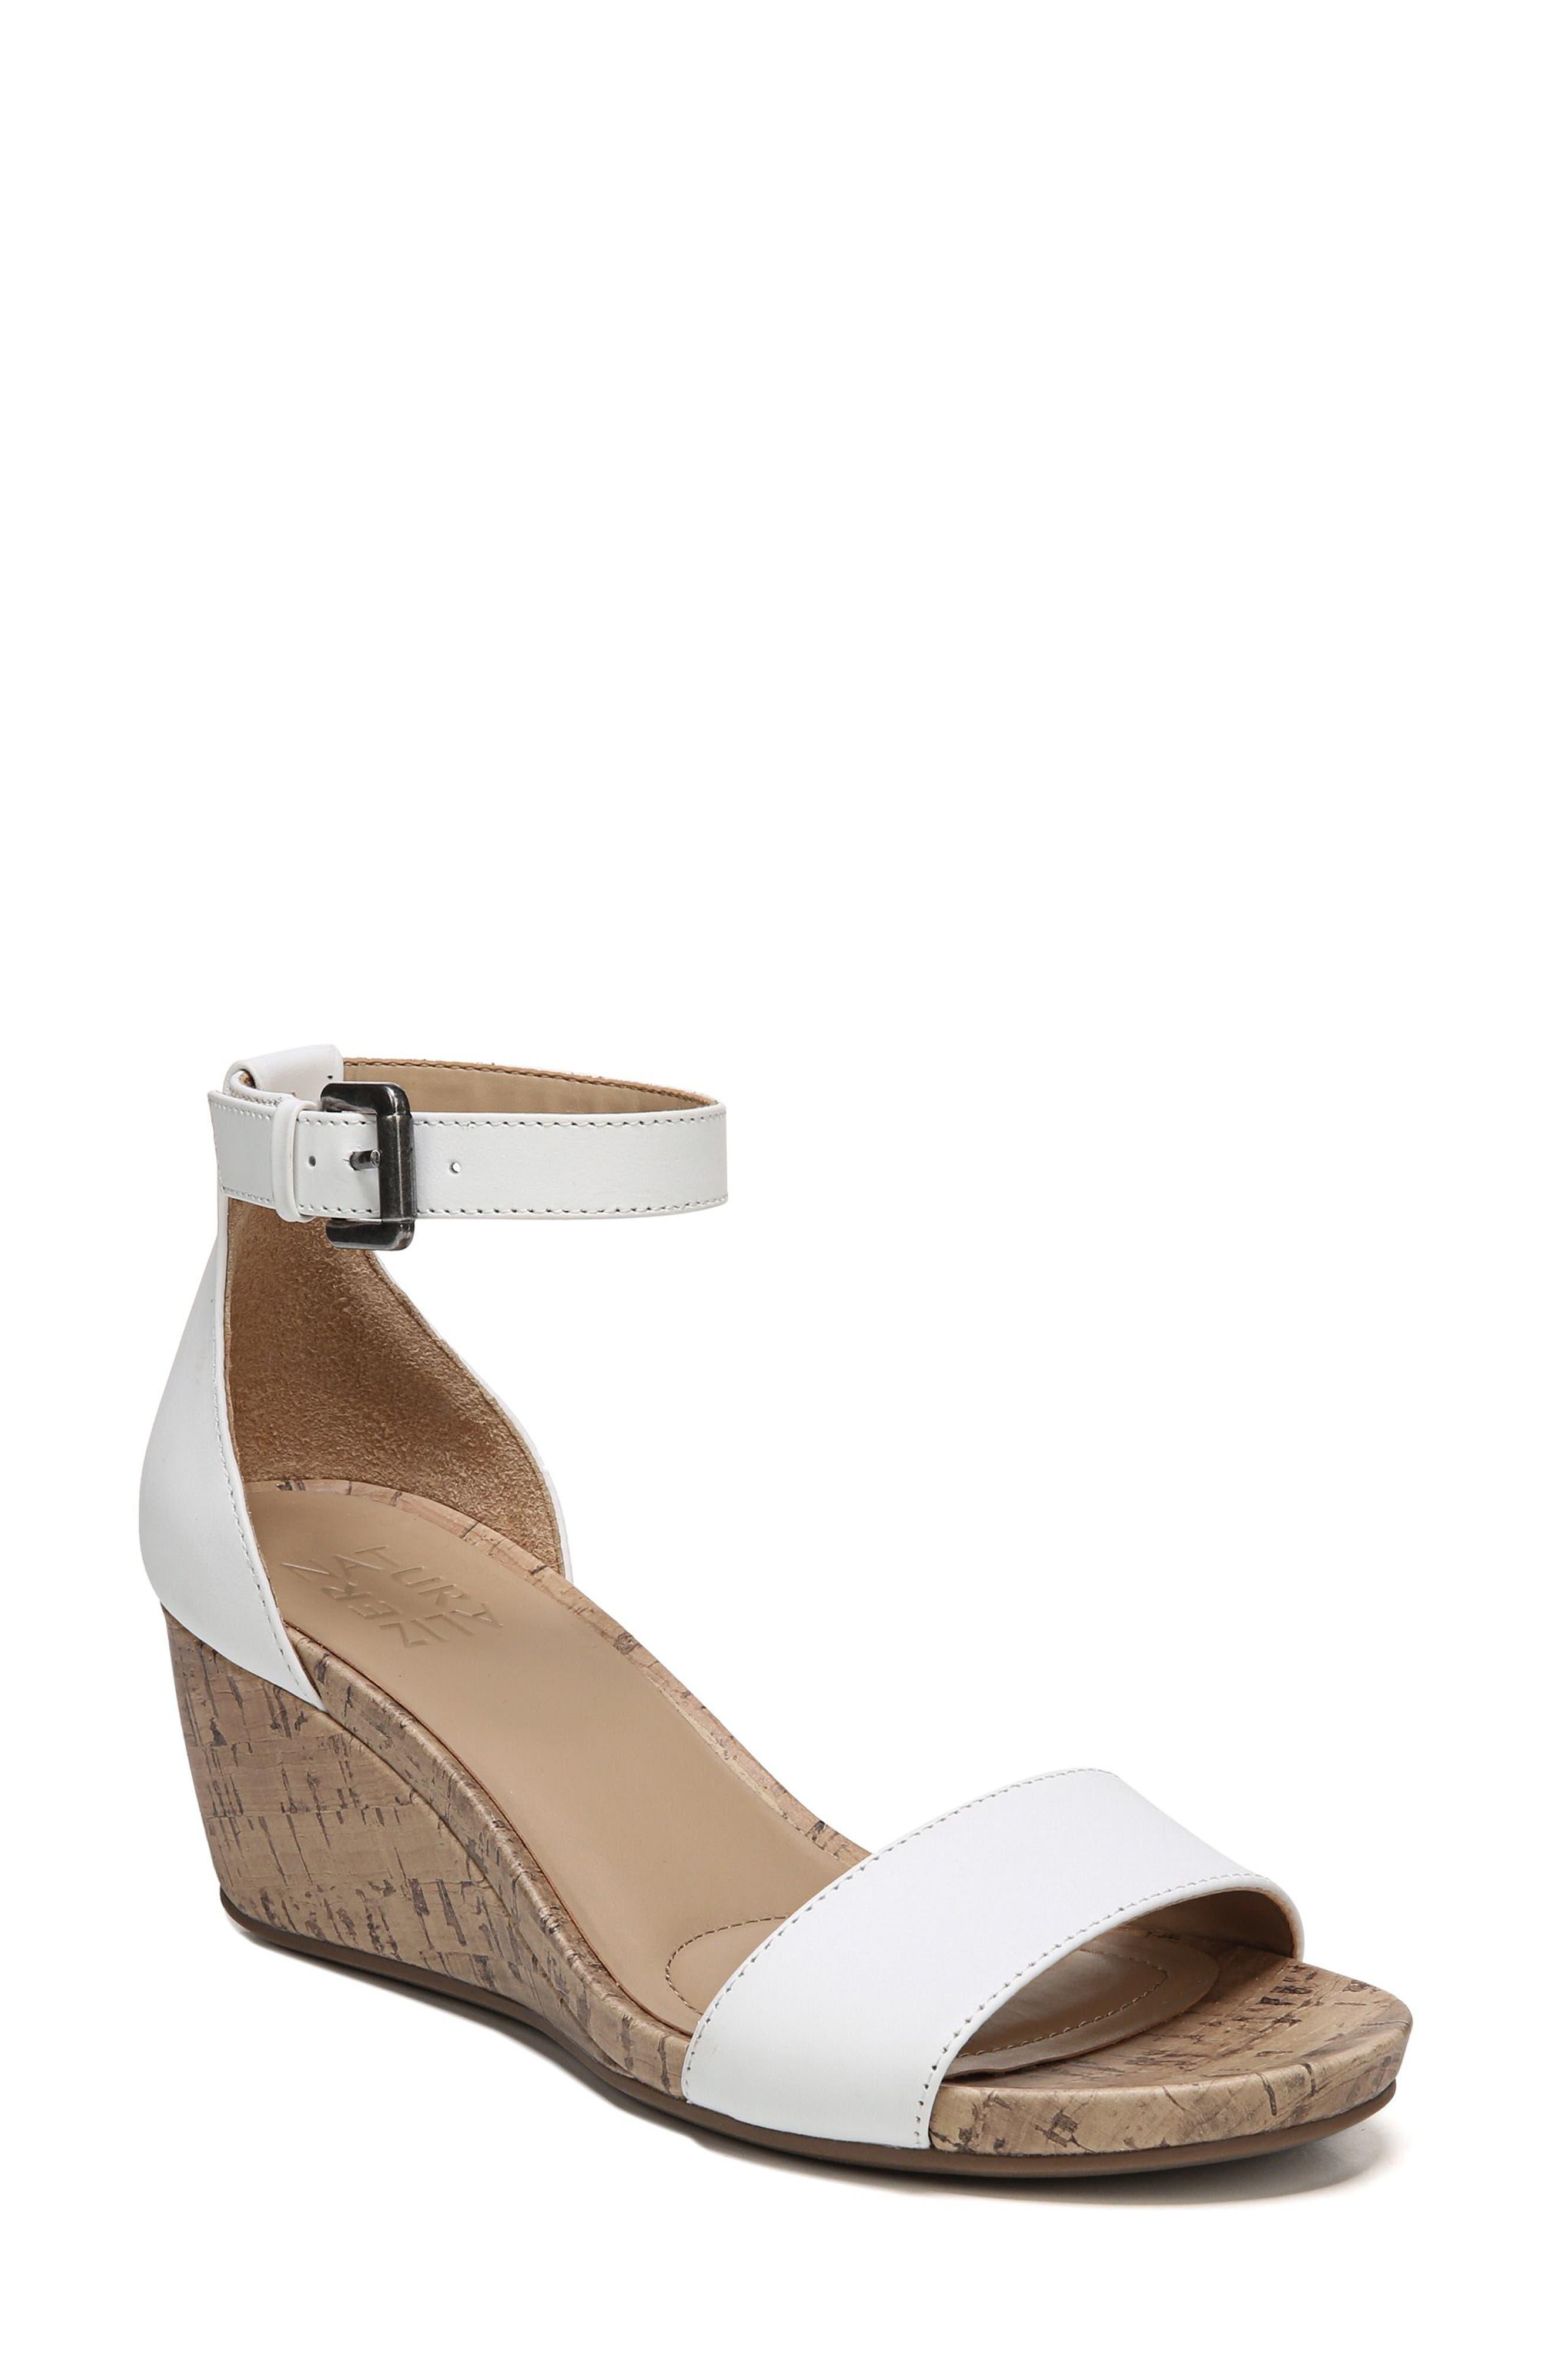 Cami Wedge Sandal,                             Alternate thumbnail 2, color,                             WHITE LEATHER